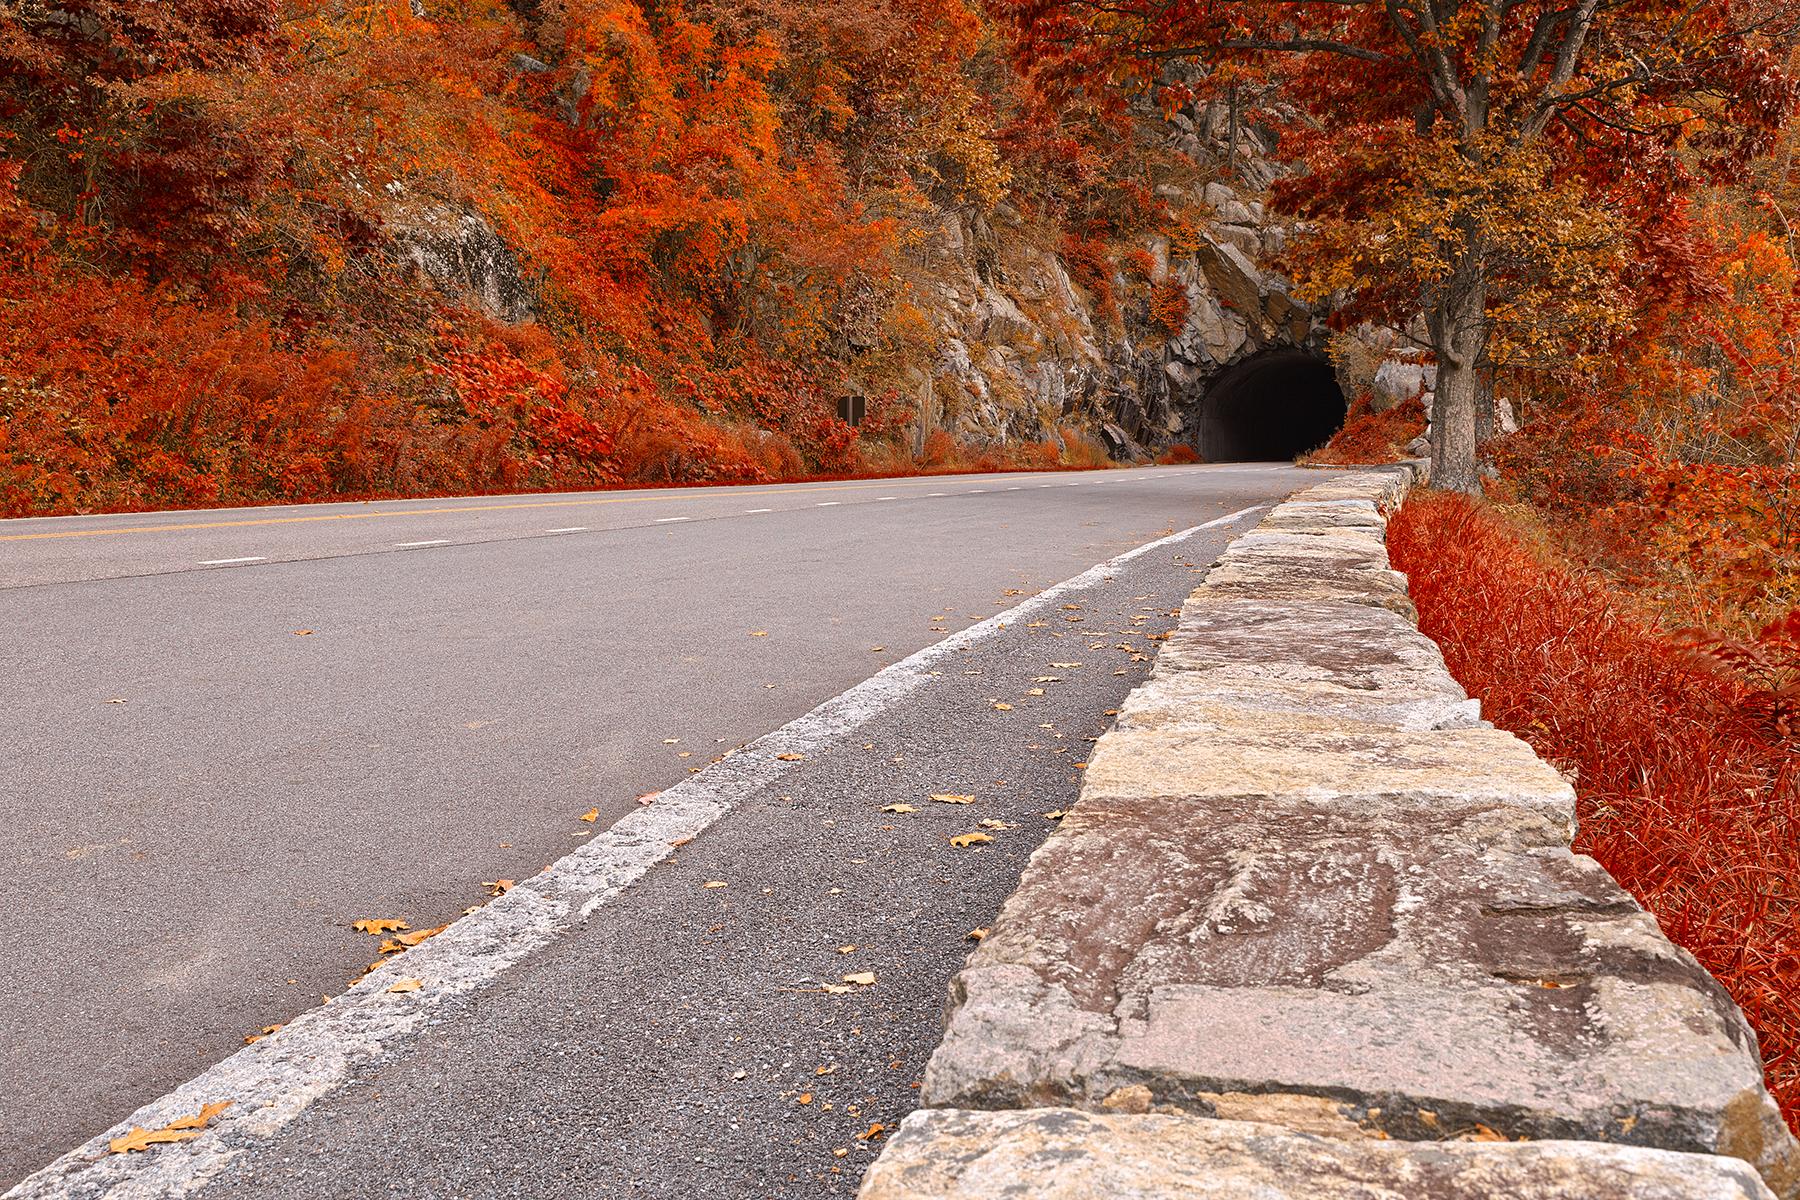 Skyline tunnel drive - ruby autumn hdr photo